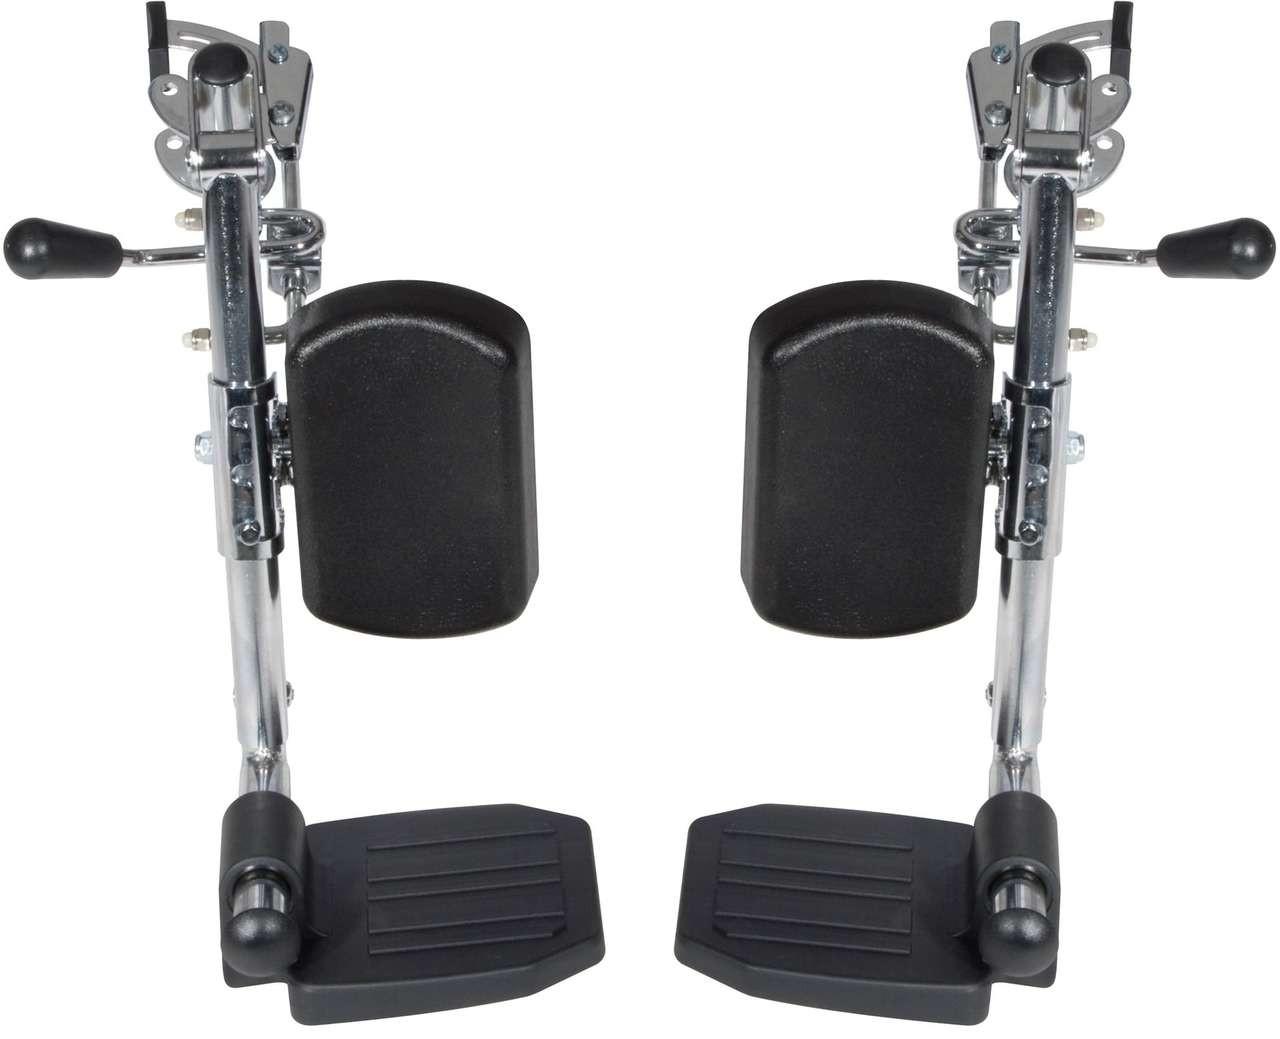 hip chair rental ergonomic settings drive medical swing away elevating legrests baron